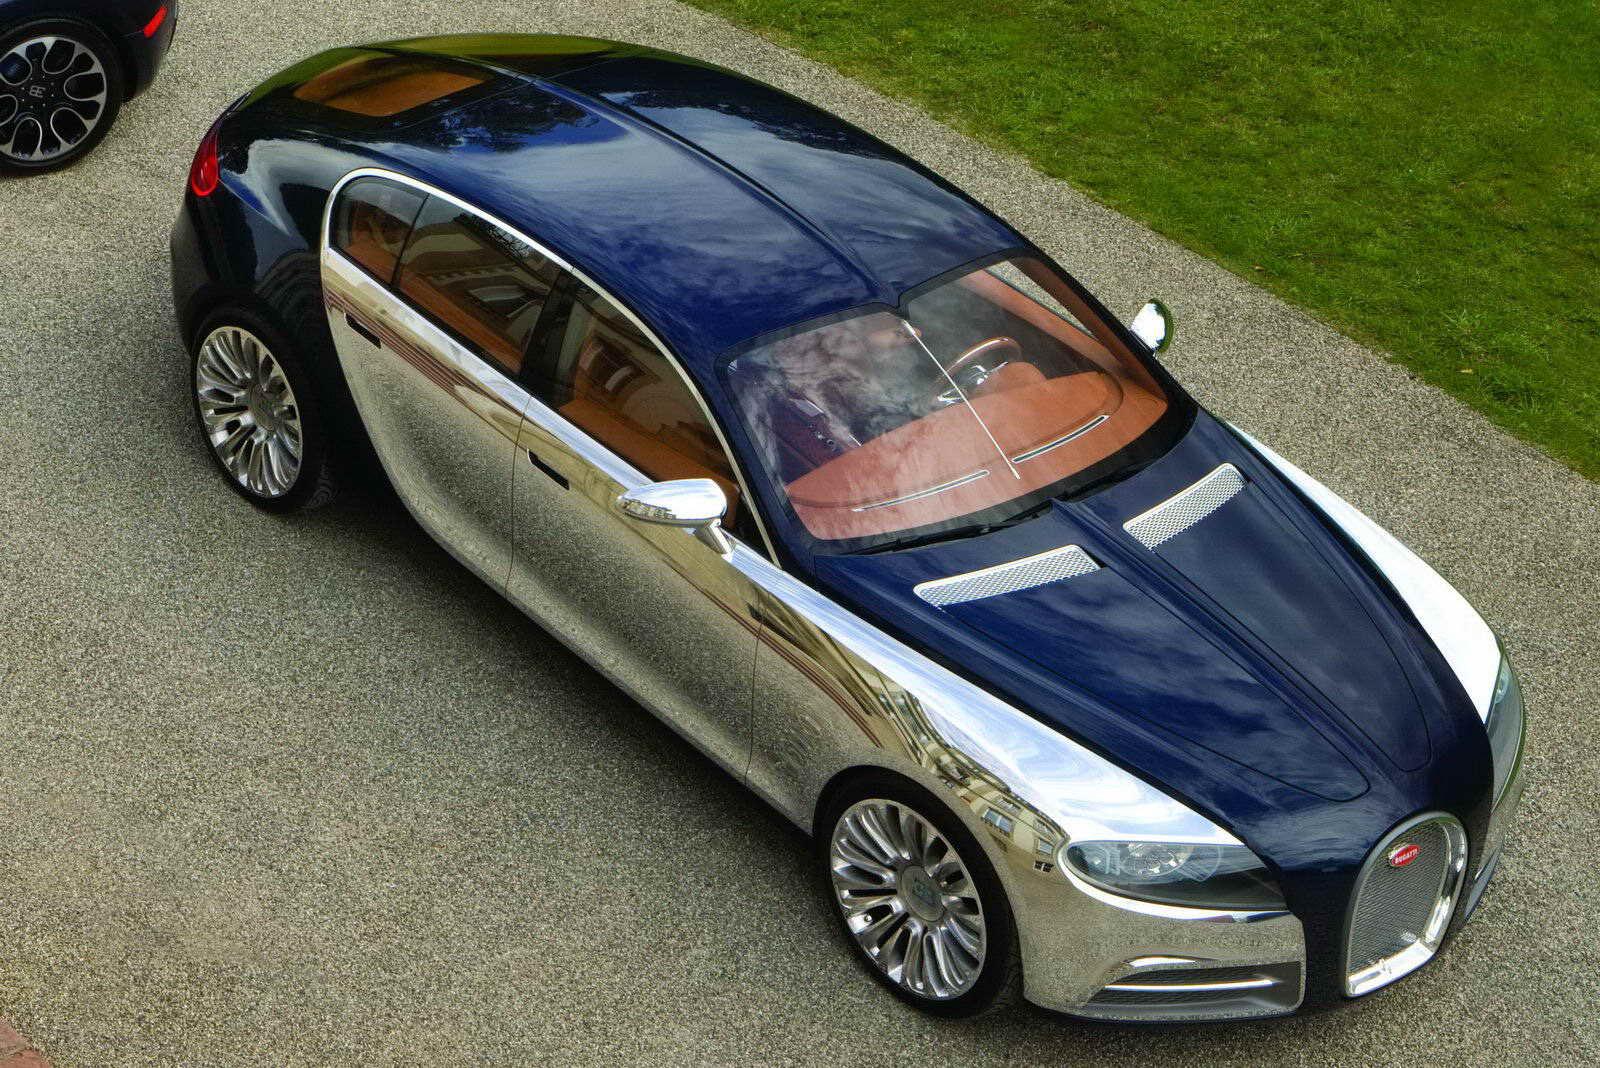 Bugatti_Galibier_16C_2014_dailyauto.ru_01.jpg